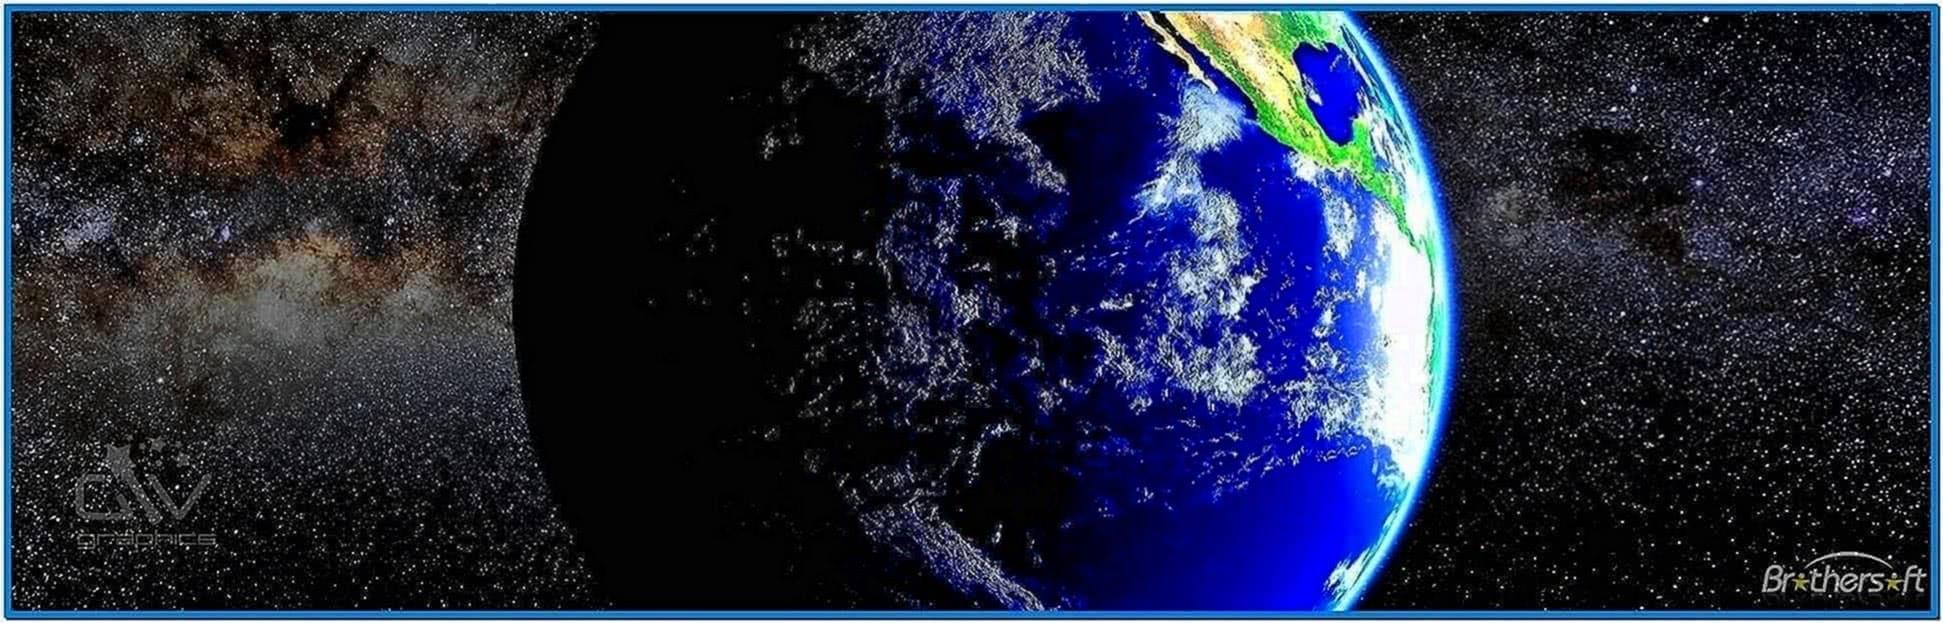 Planet Earth Screensaver 2.1